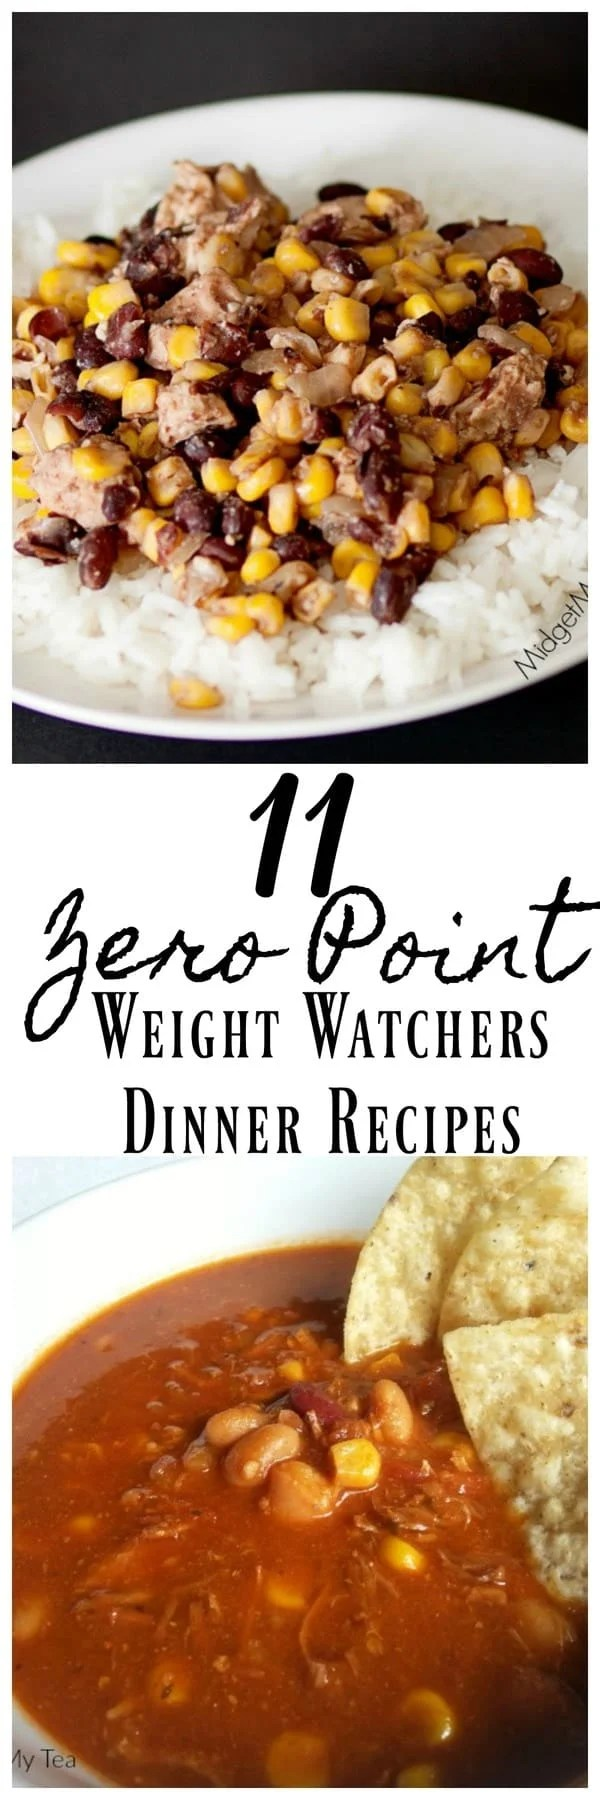 11 Zero Point Weight Watchers Dinner Recipes  MidgetMomma